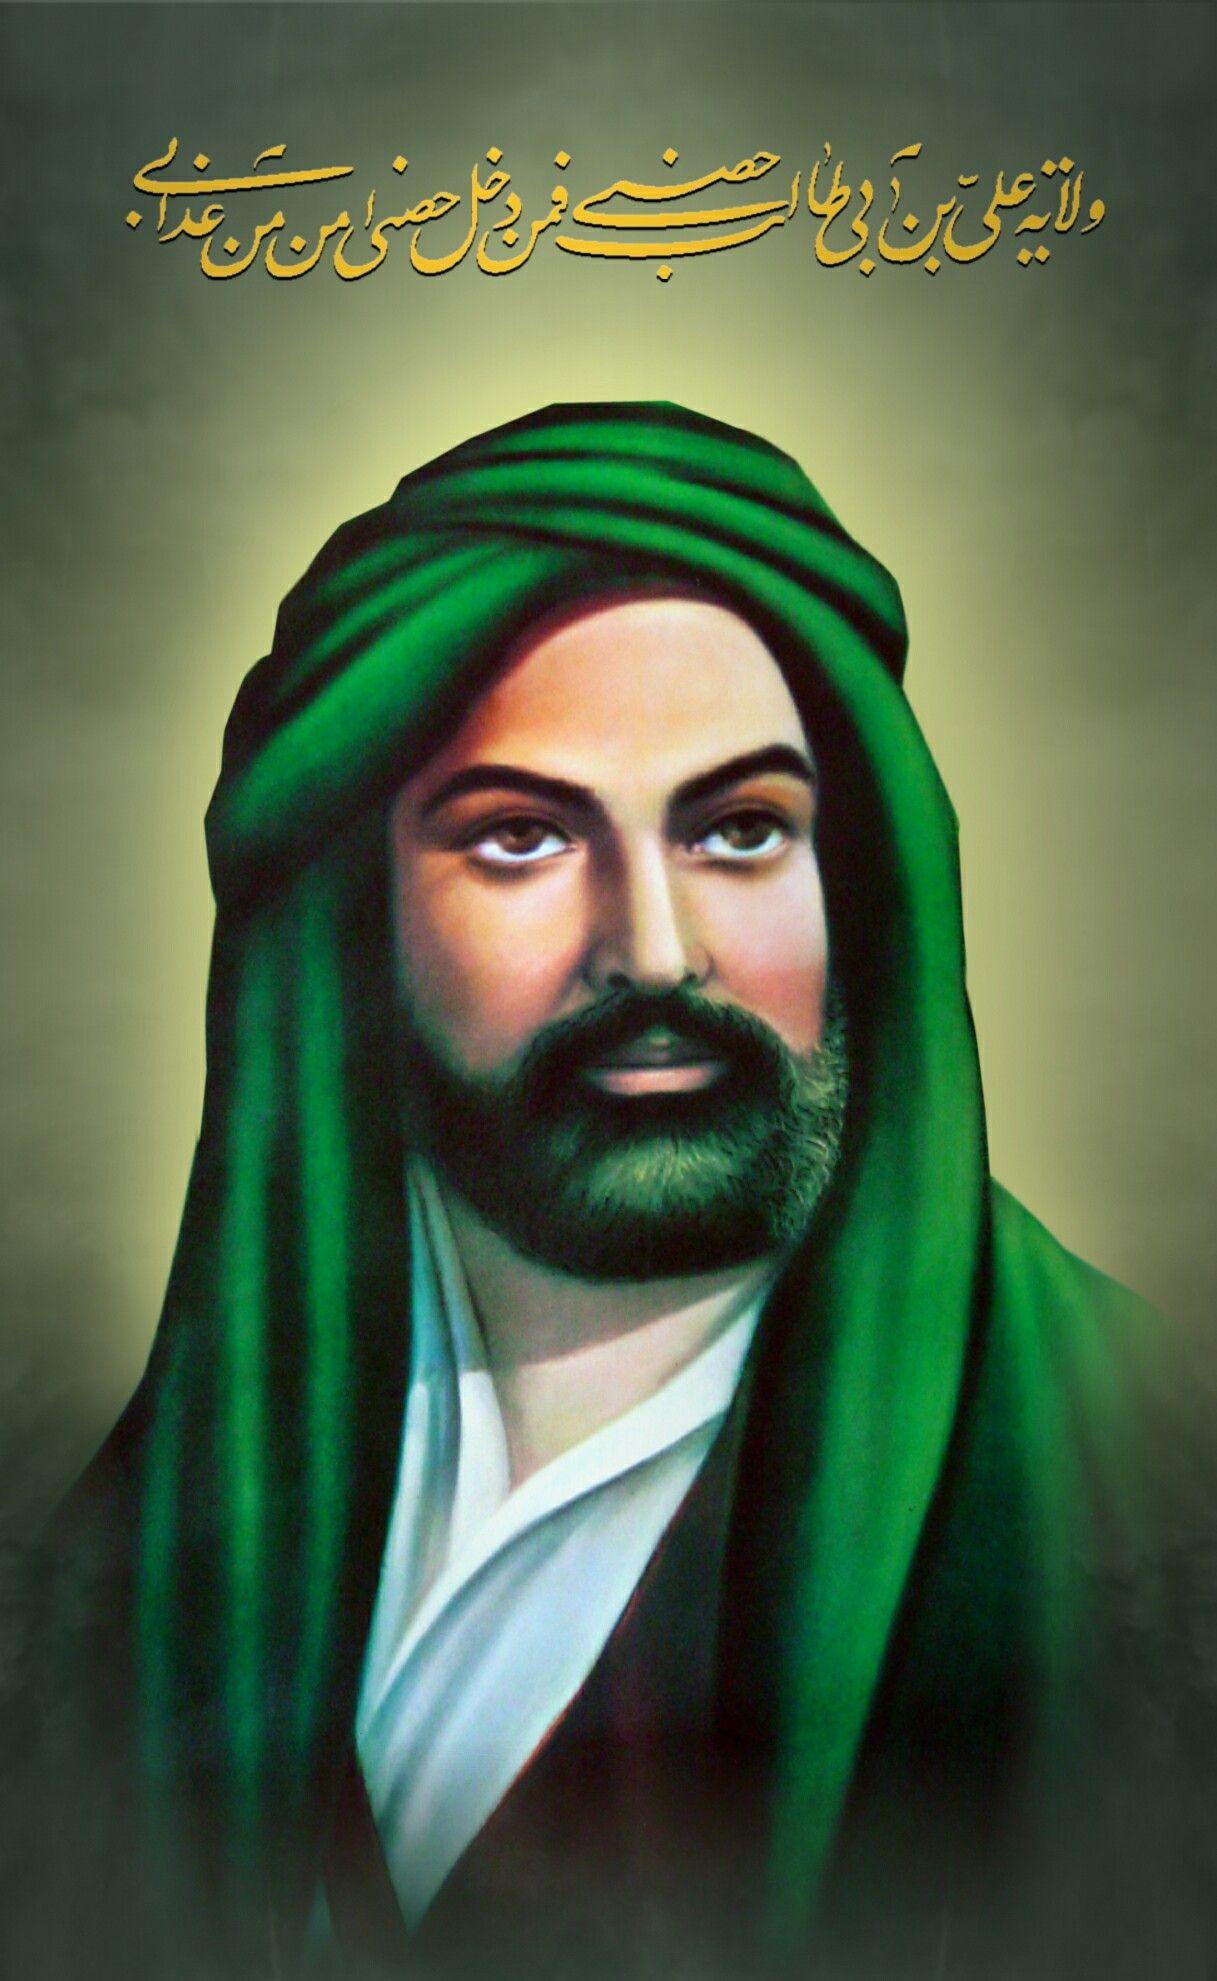 Hz Ali شمايل حضرت امام على صور الامام علي Mola Ali Islamic Pictures Islamic Calligraphy Painting